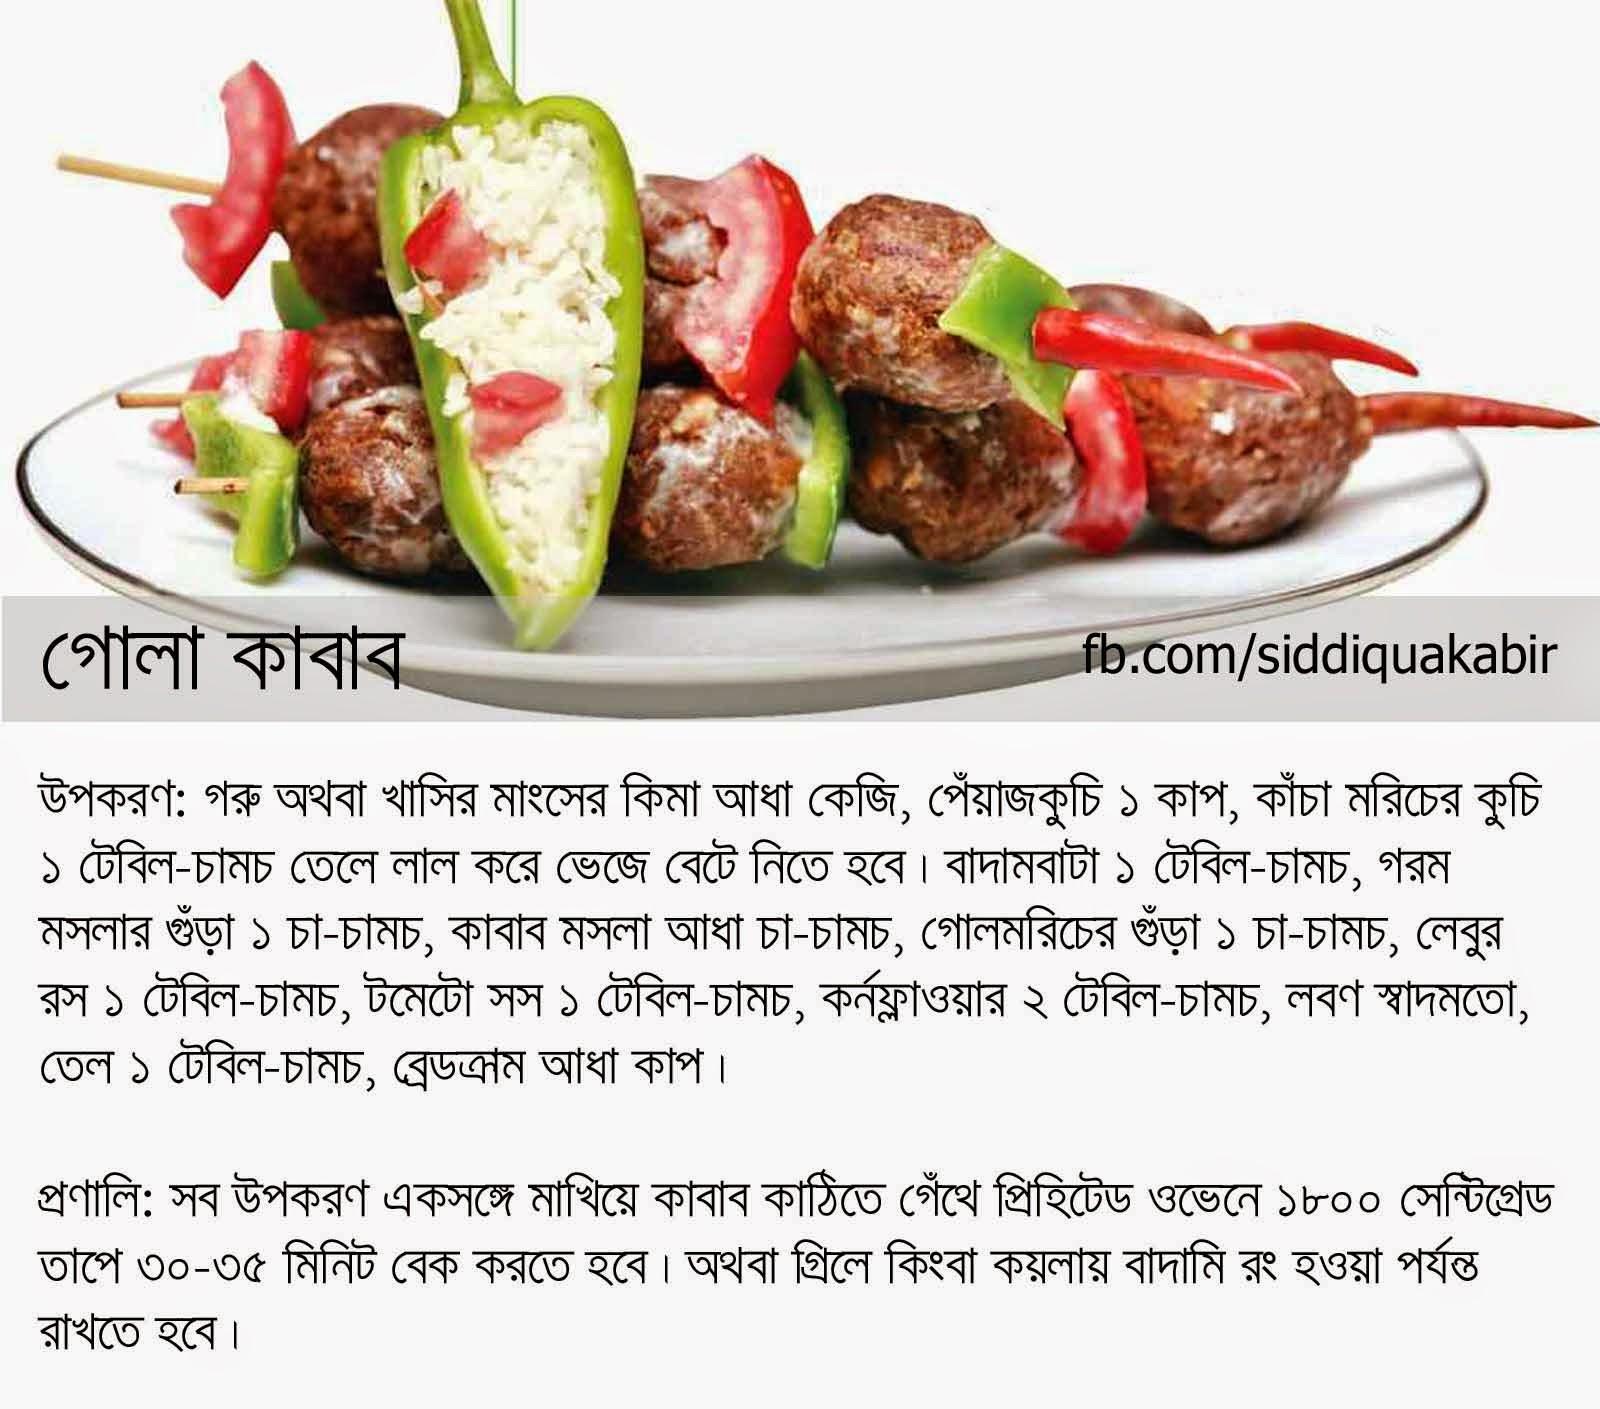 Bangali Foods Bahari Kabab Recipe In Bangla Font